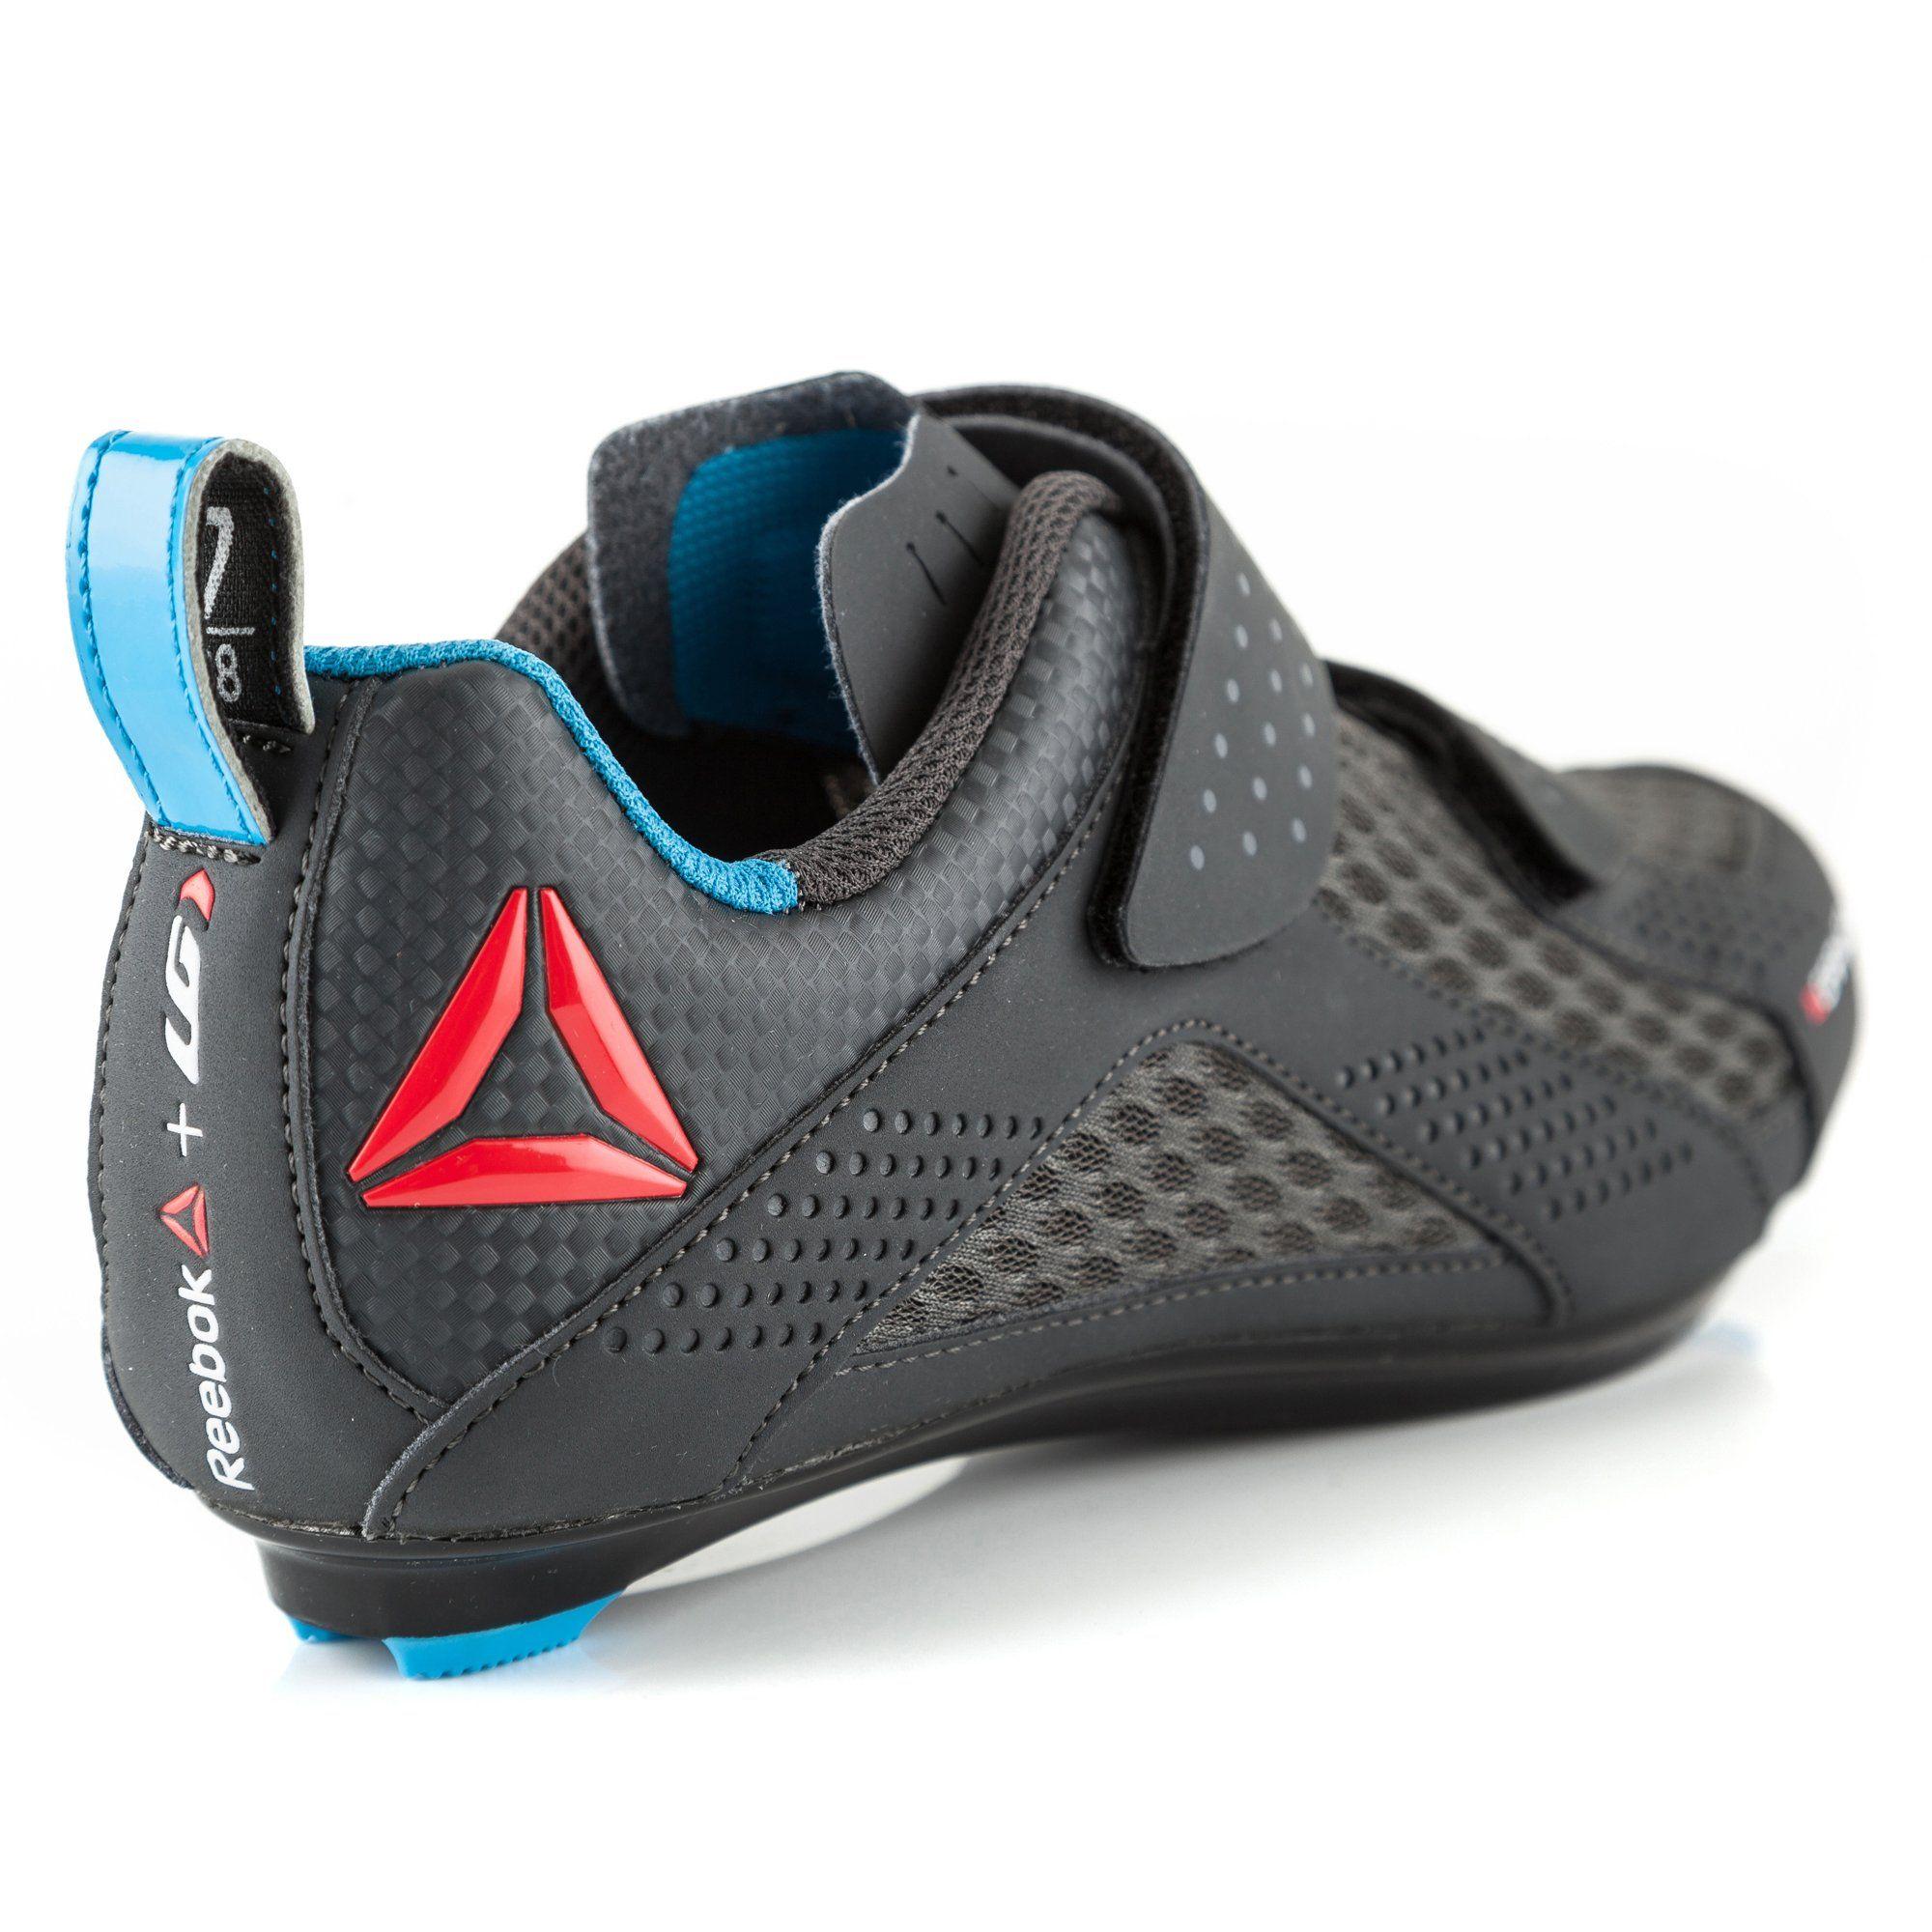 c0806de836b63 Louis Garneau Womens Actifly Indoor Cycling Shoes A Collaboration ...